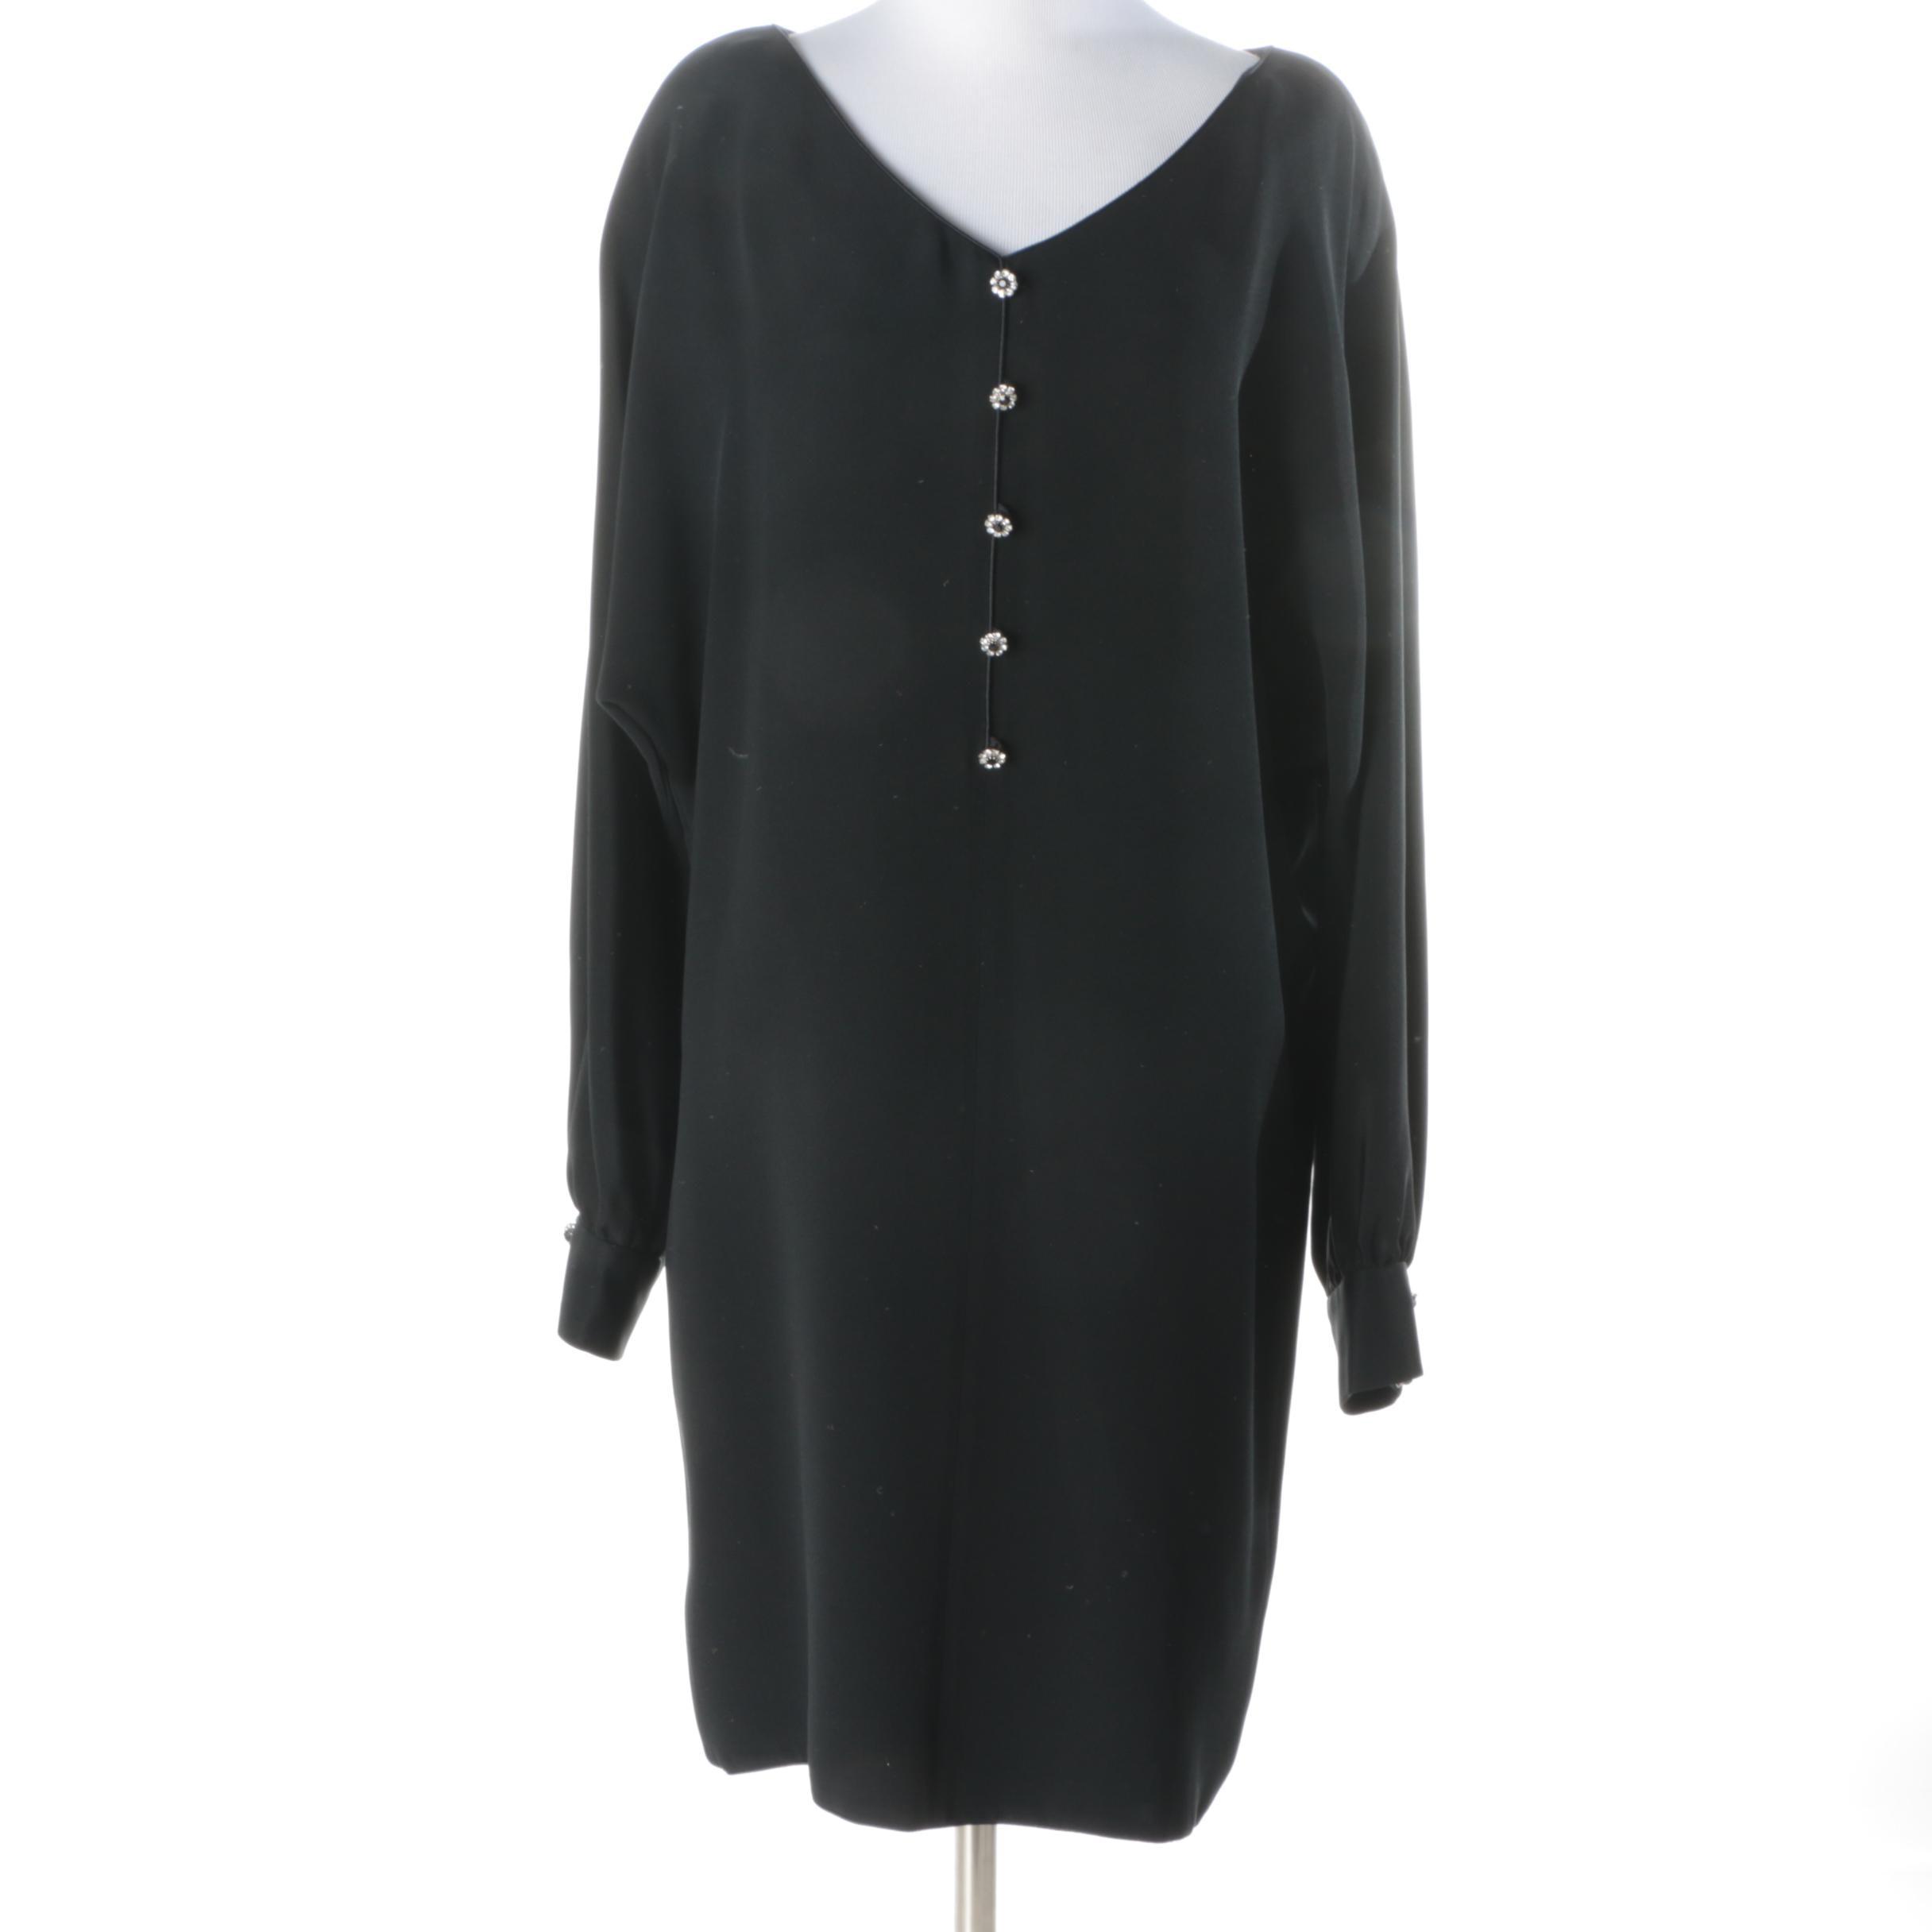 Mary McFadden Black Dress